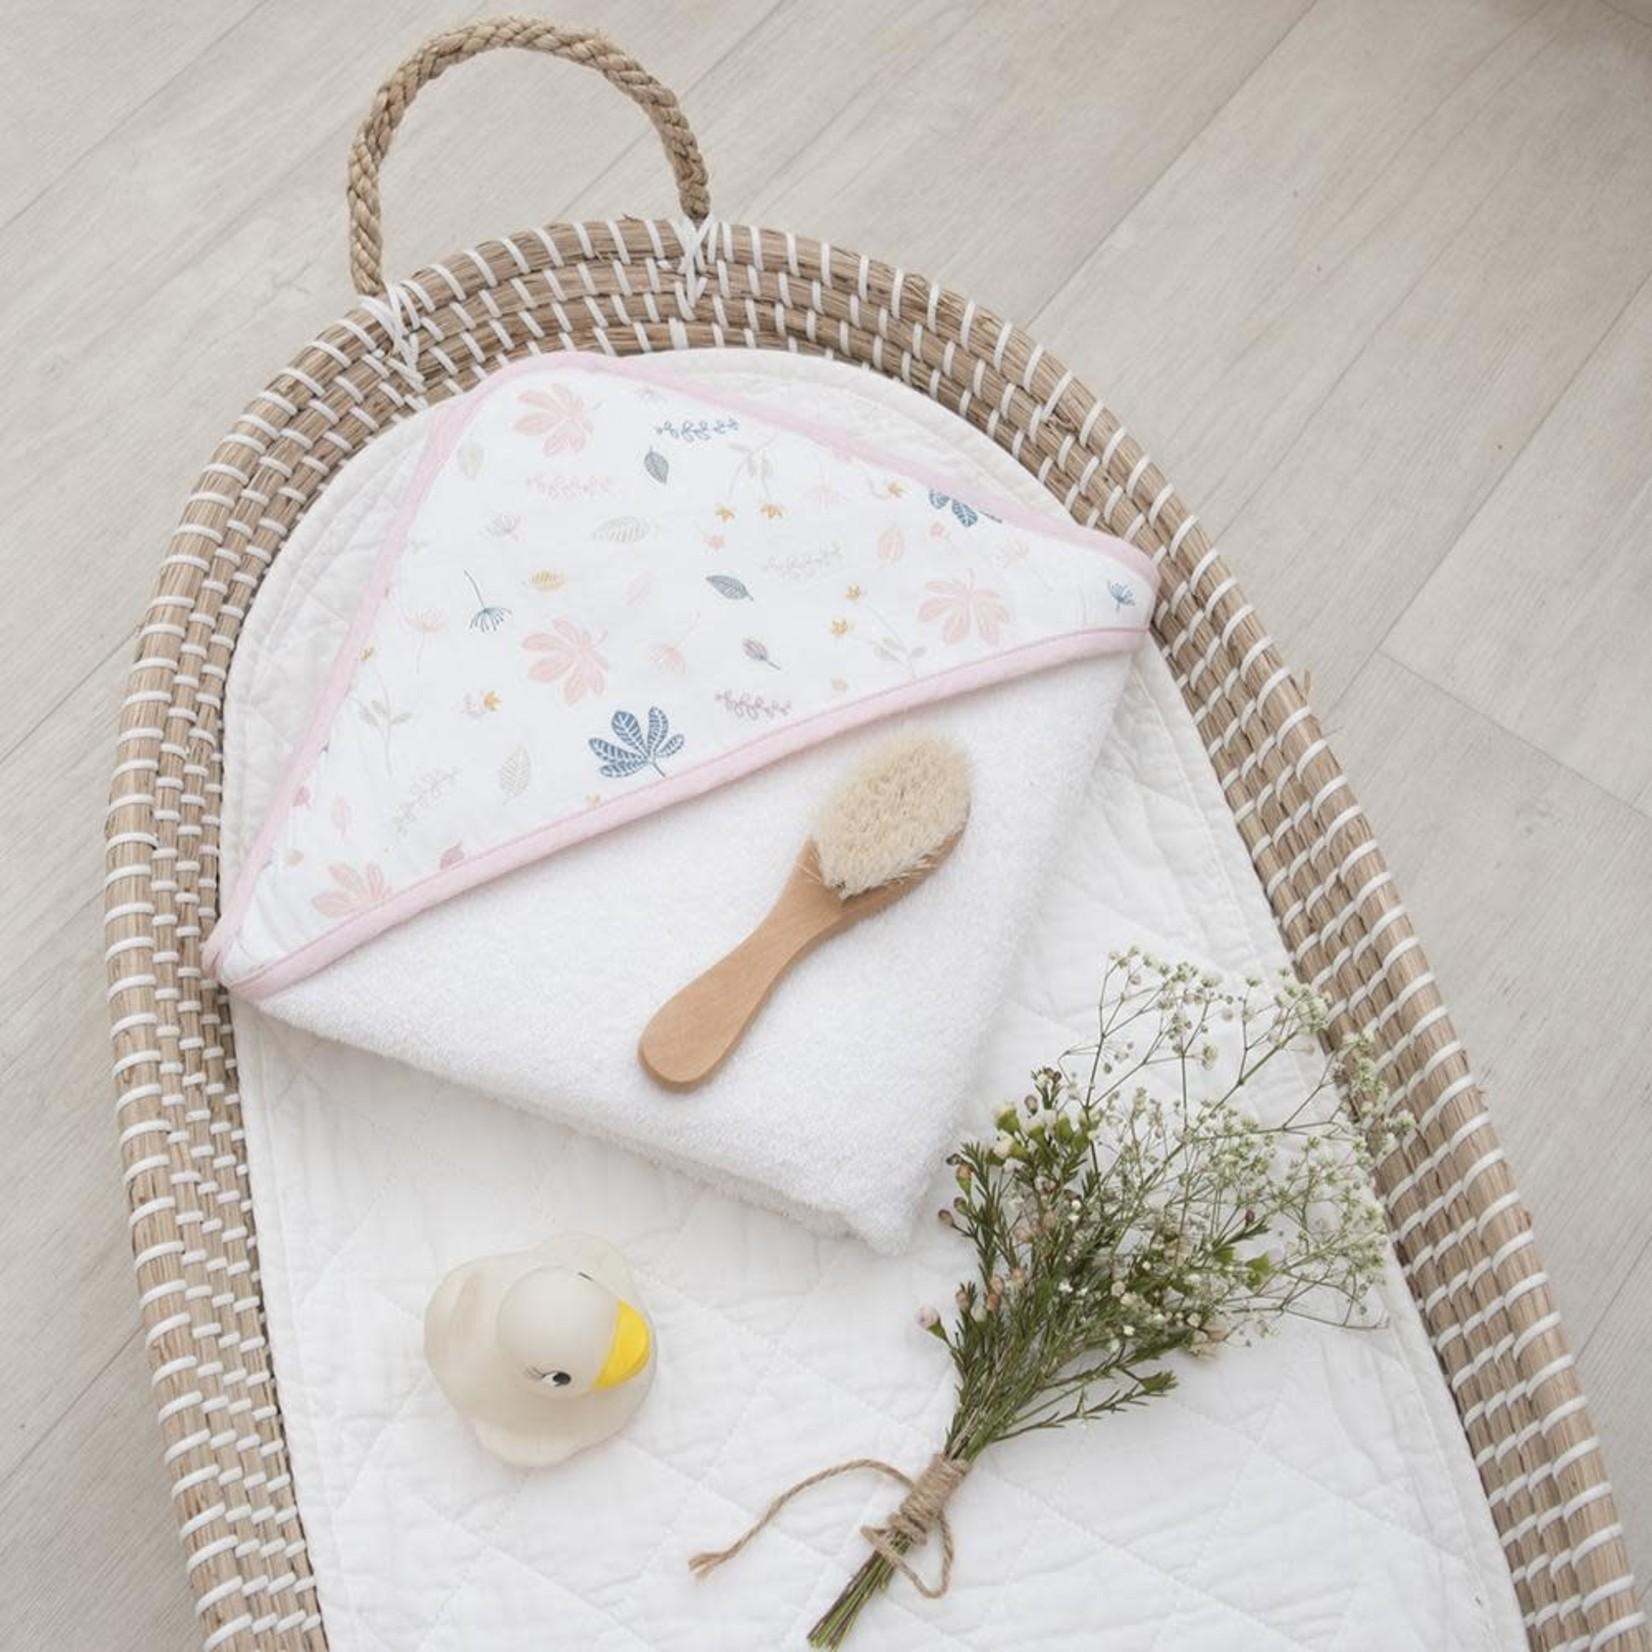 Living Textiles Living Textiles Organic Hooded Towel - Botanical